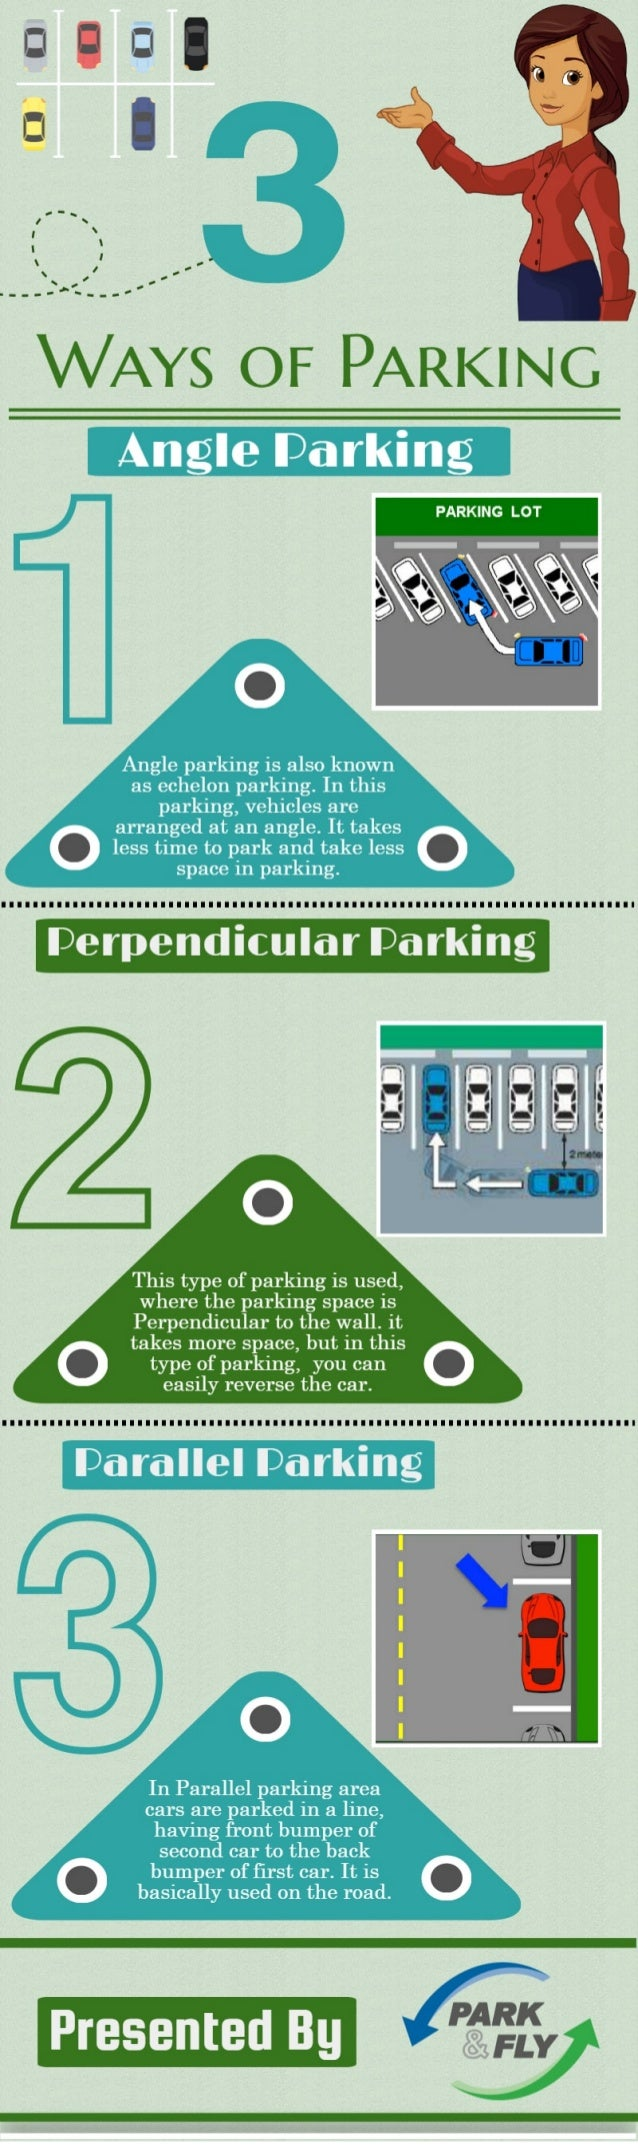 Three Ways of Parking